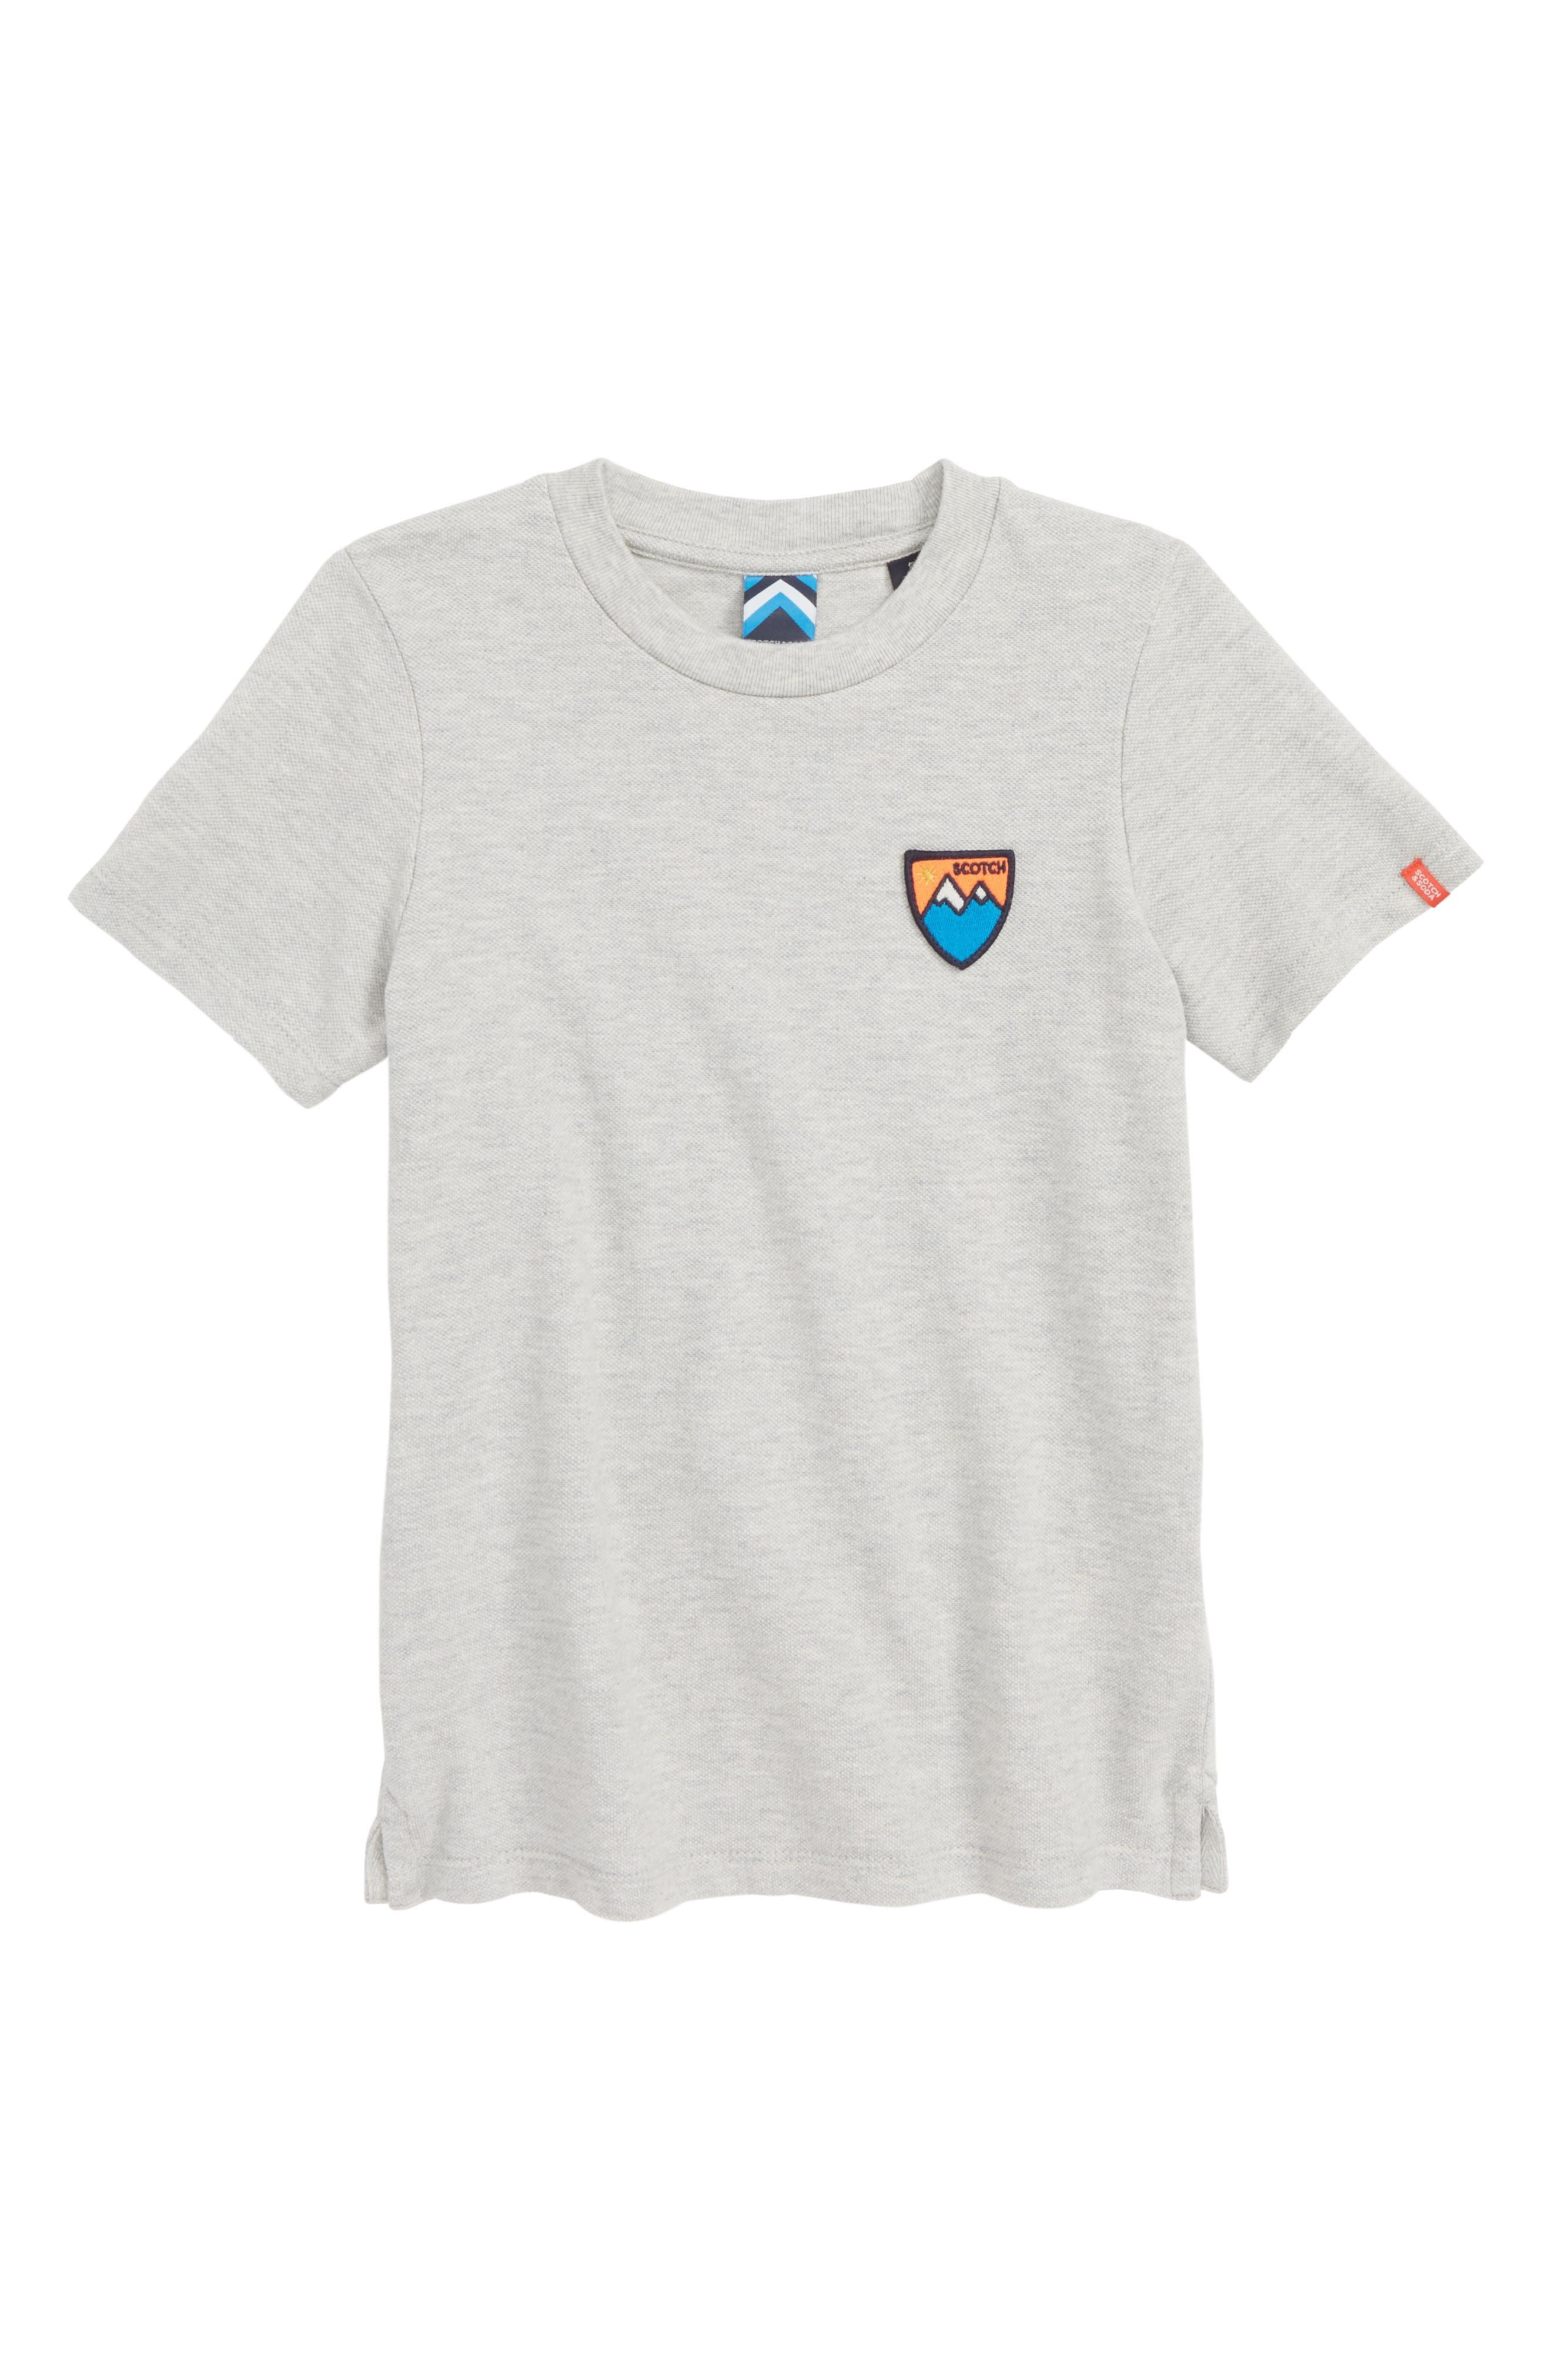 Alpine T-Shirt,                             Main thumbnail 1, color,                             GREY